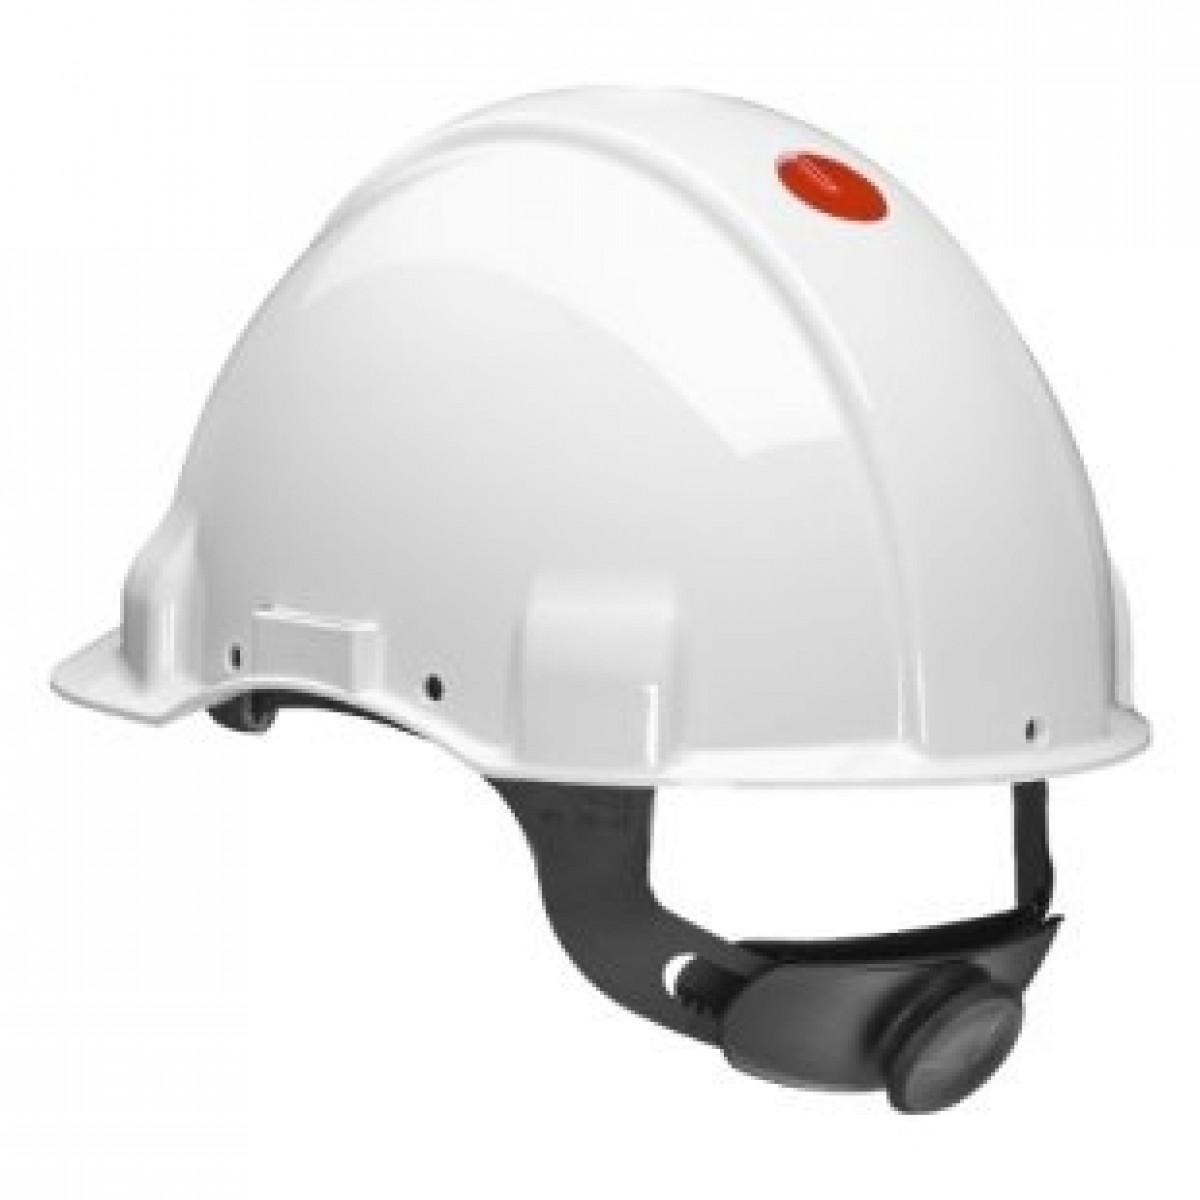 Sikkerhedshjelm PELTOR hvid-31